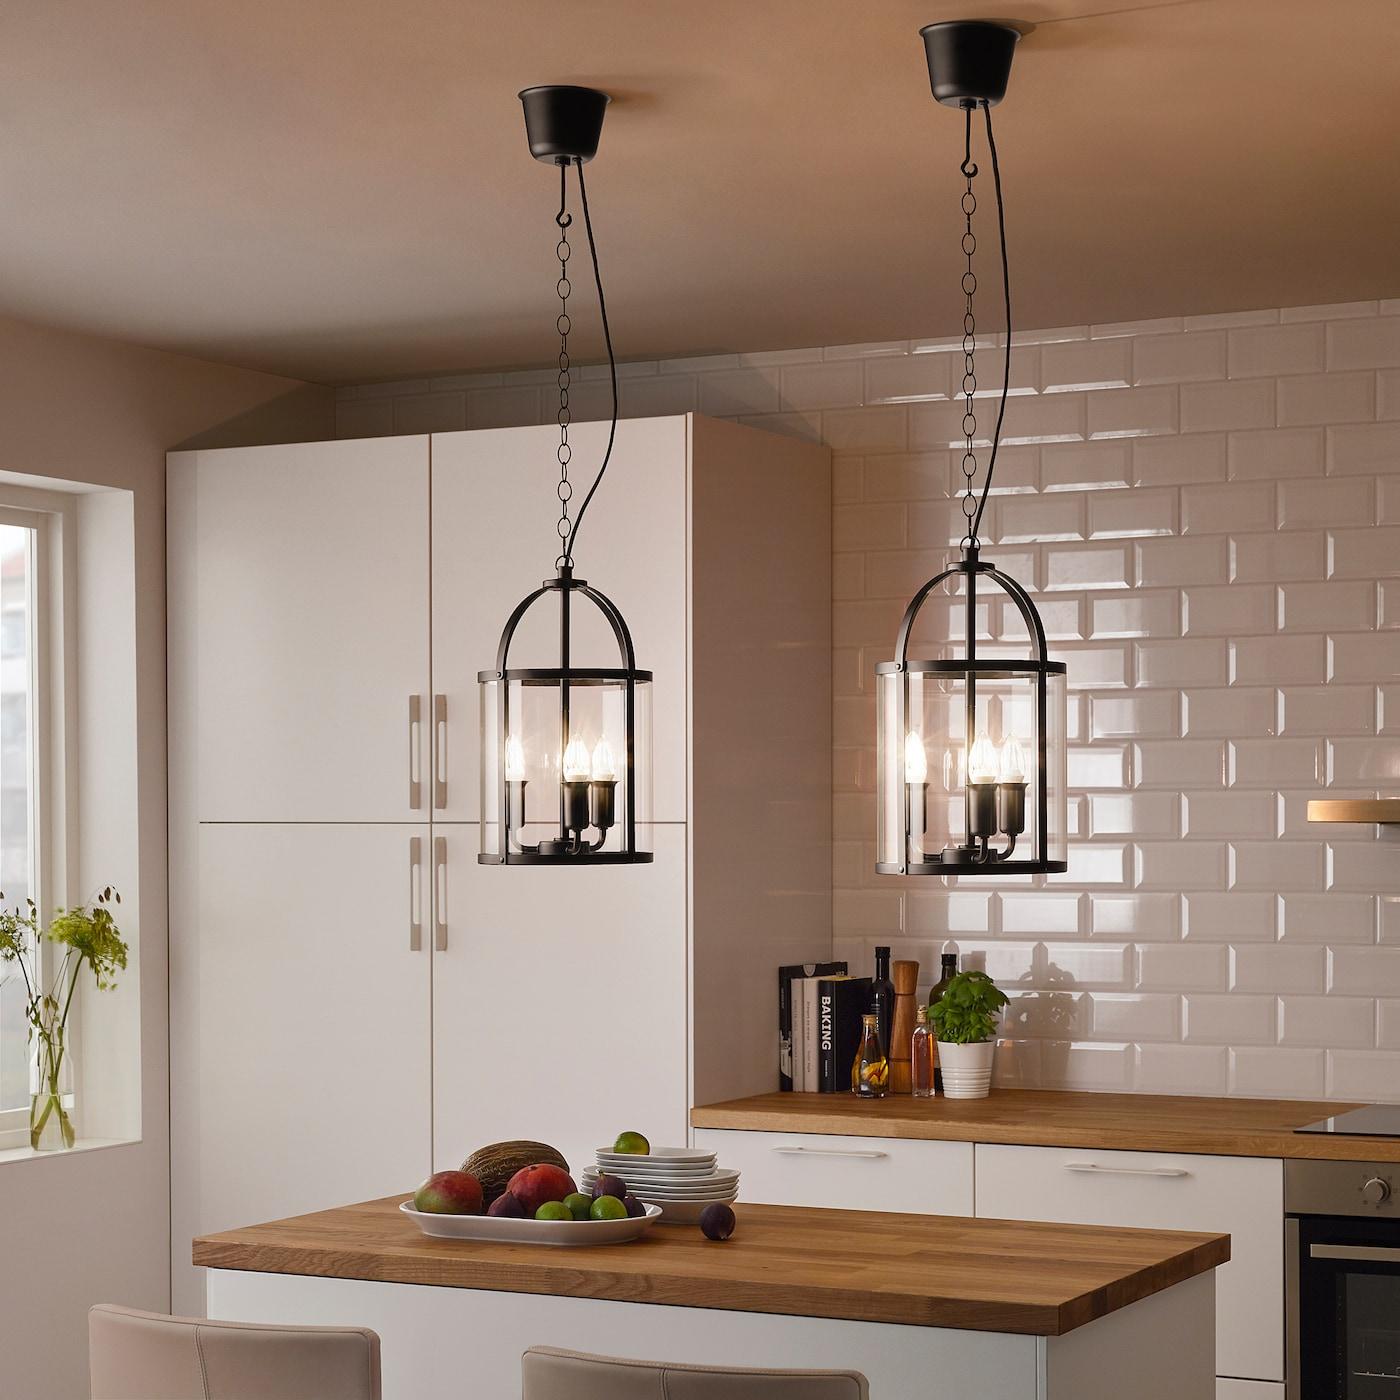 Picture of: Galjon Loftlampe Sort Transparent Glas Ikea